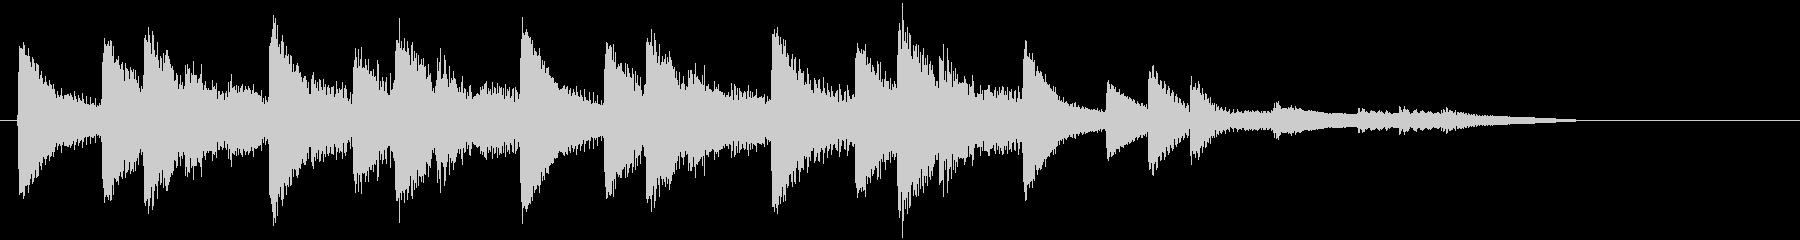 XmasキャロルオブザベルズジングルDの未再生の波形